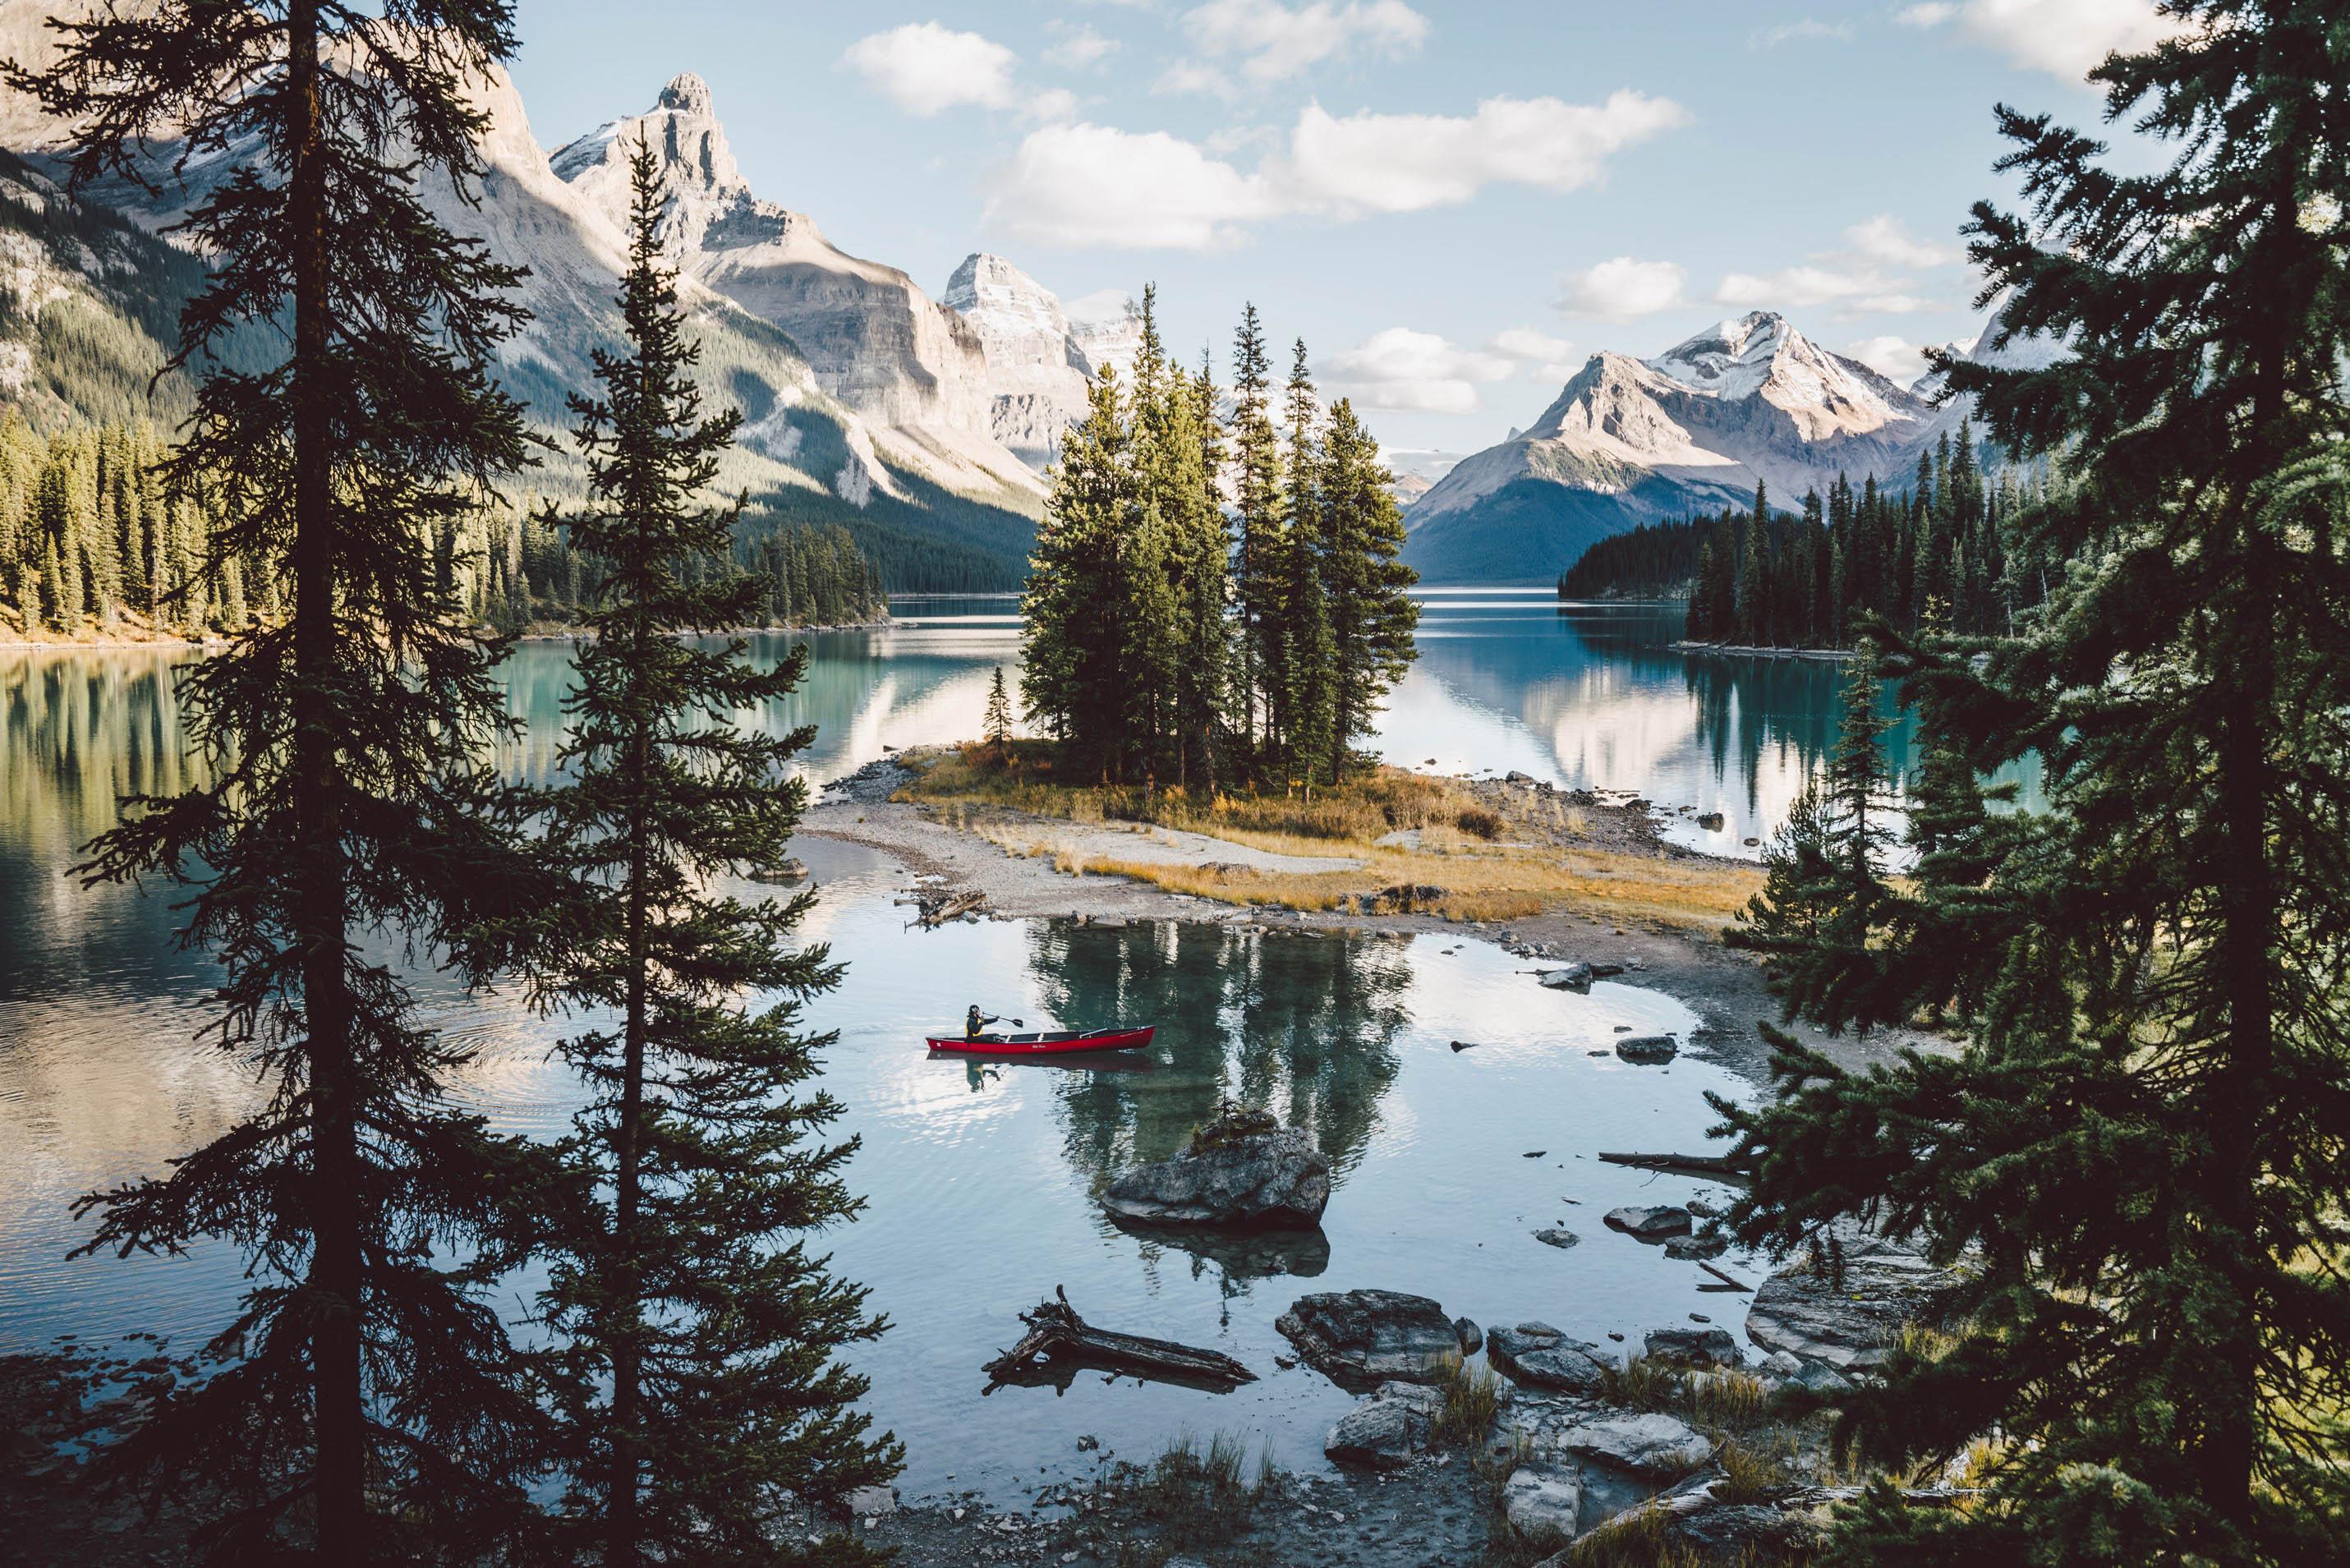 Cano, Canada, lake, kayak, paddling, mountain landscape photography, wilderness